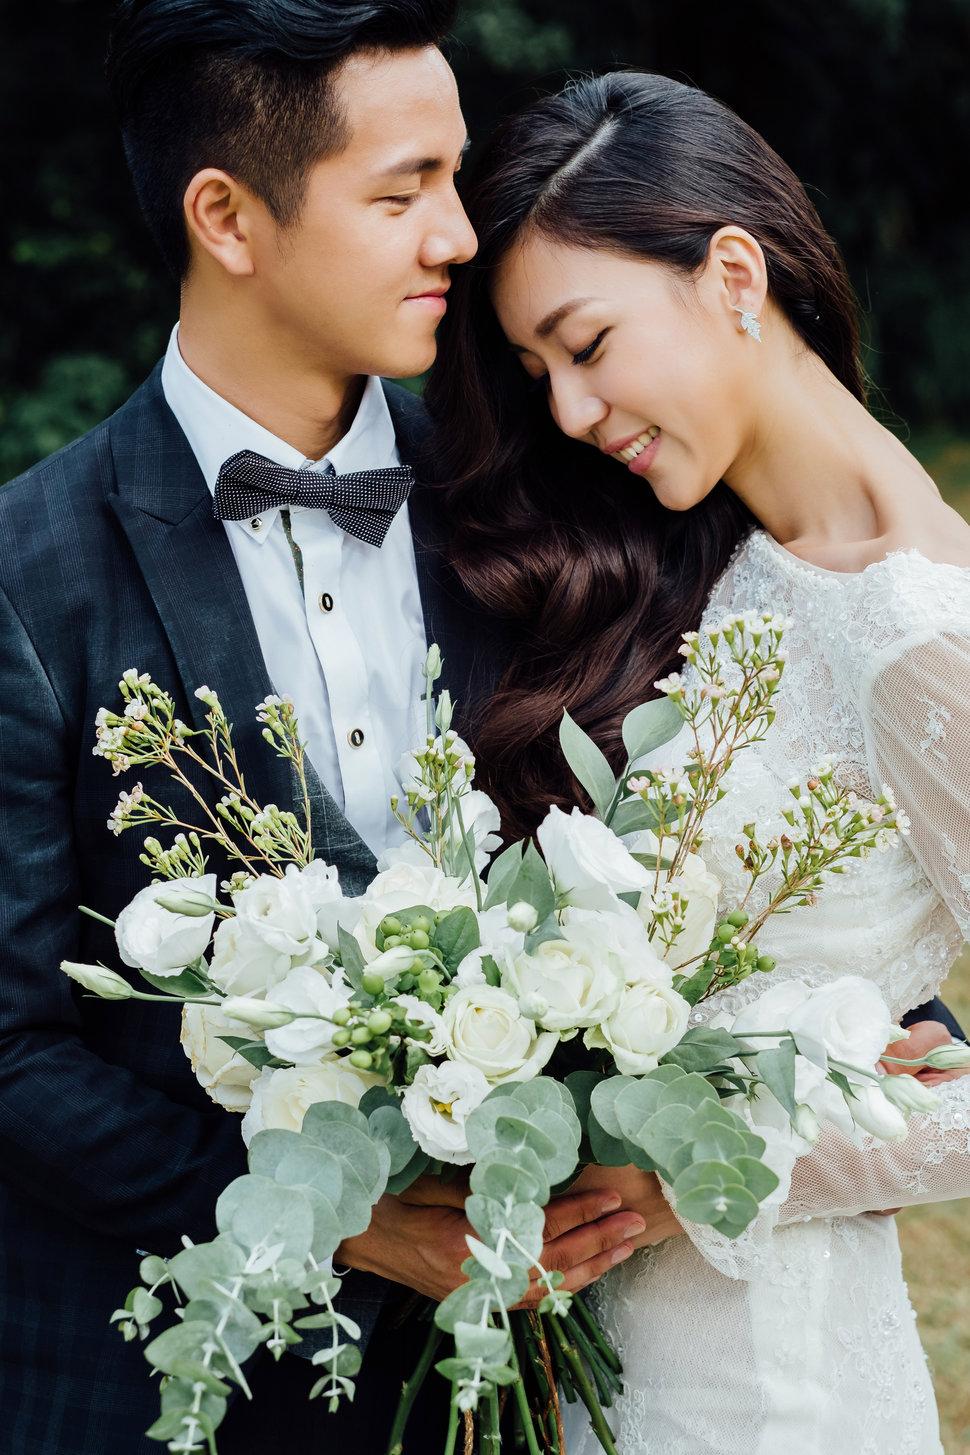 2017-07-22-16h45m12-DSCF5661 - Vicky Li 新娘秘書《結婚吧》